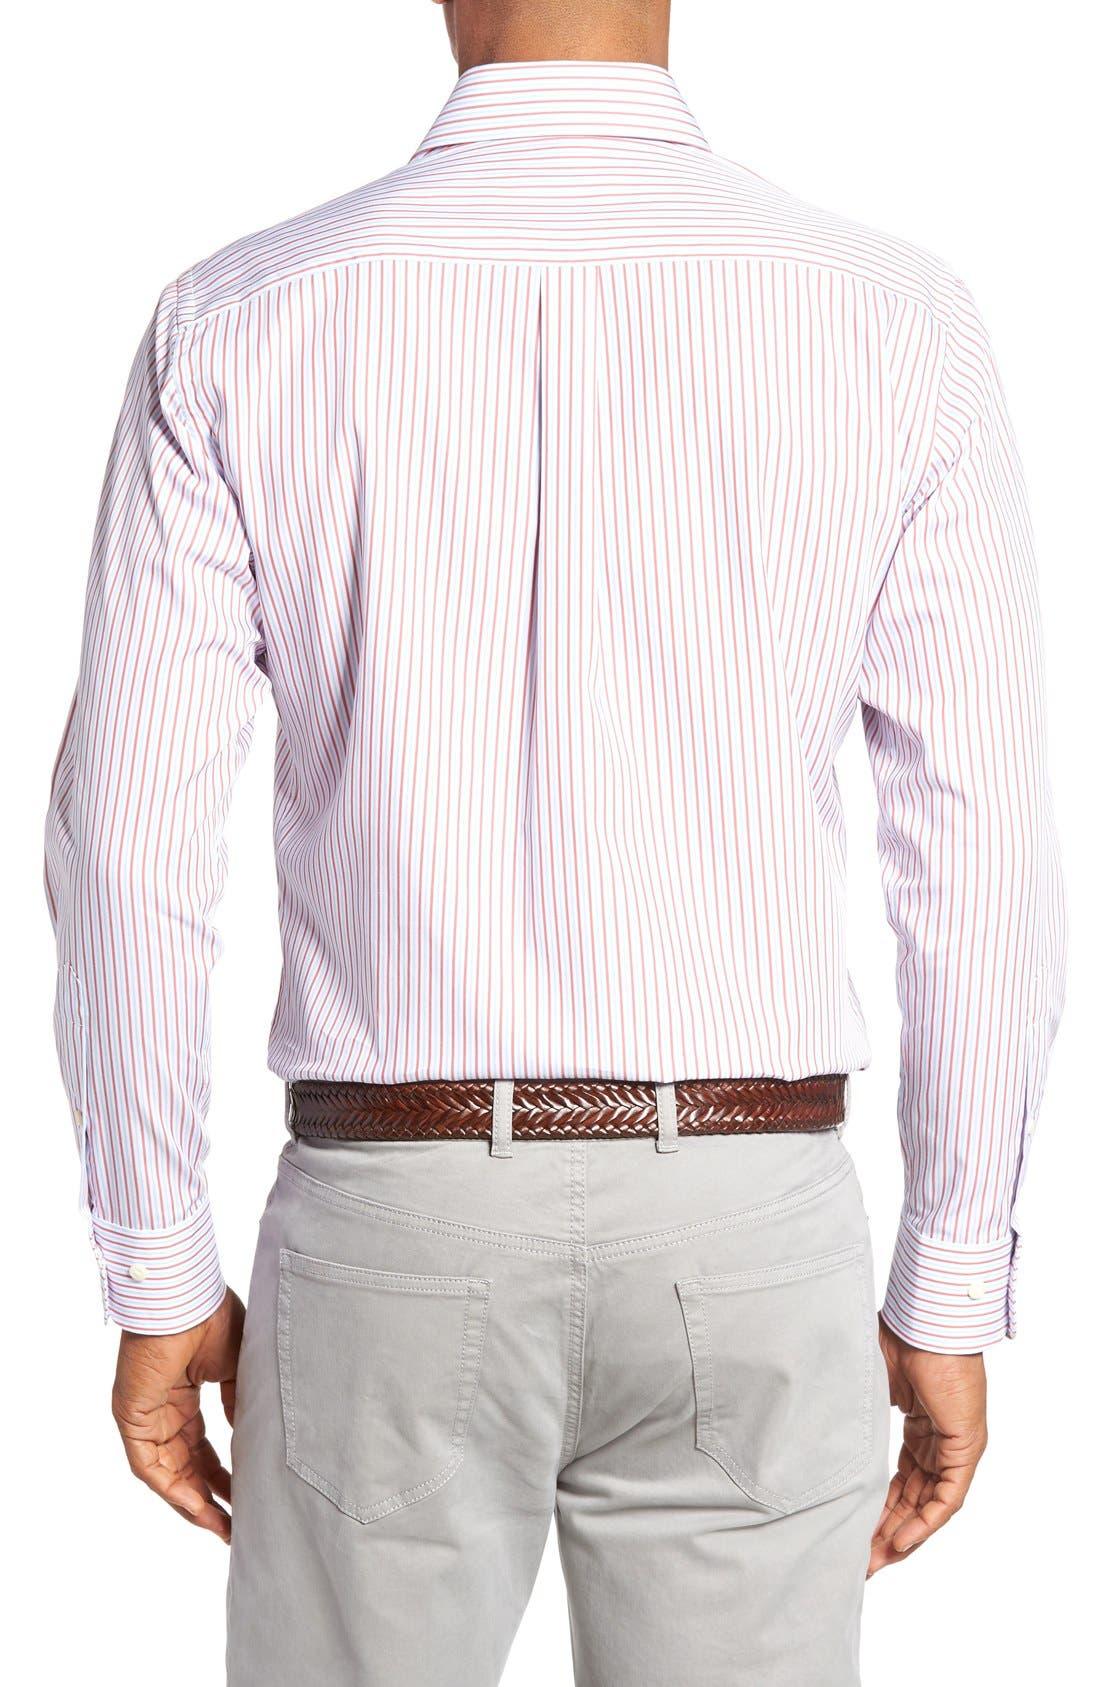 Alternate Image 2  - Peter Millar Summer Stripe Regular Fit Sport Shirt